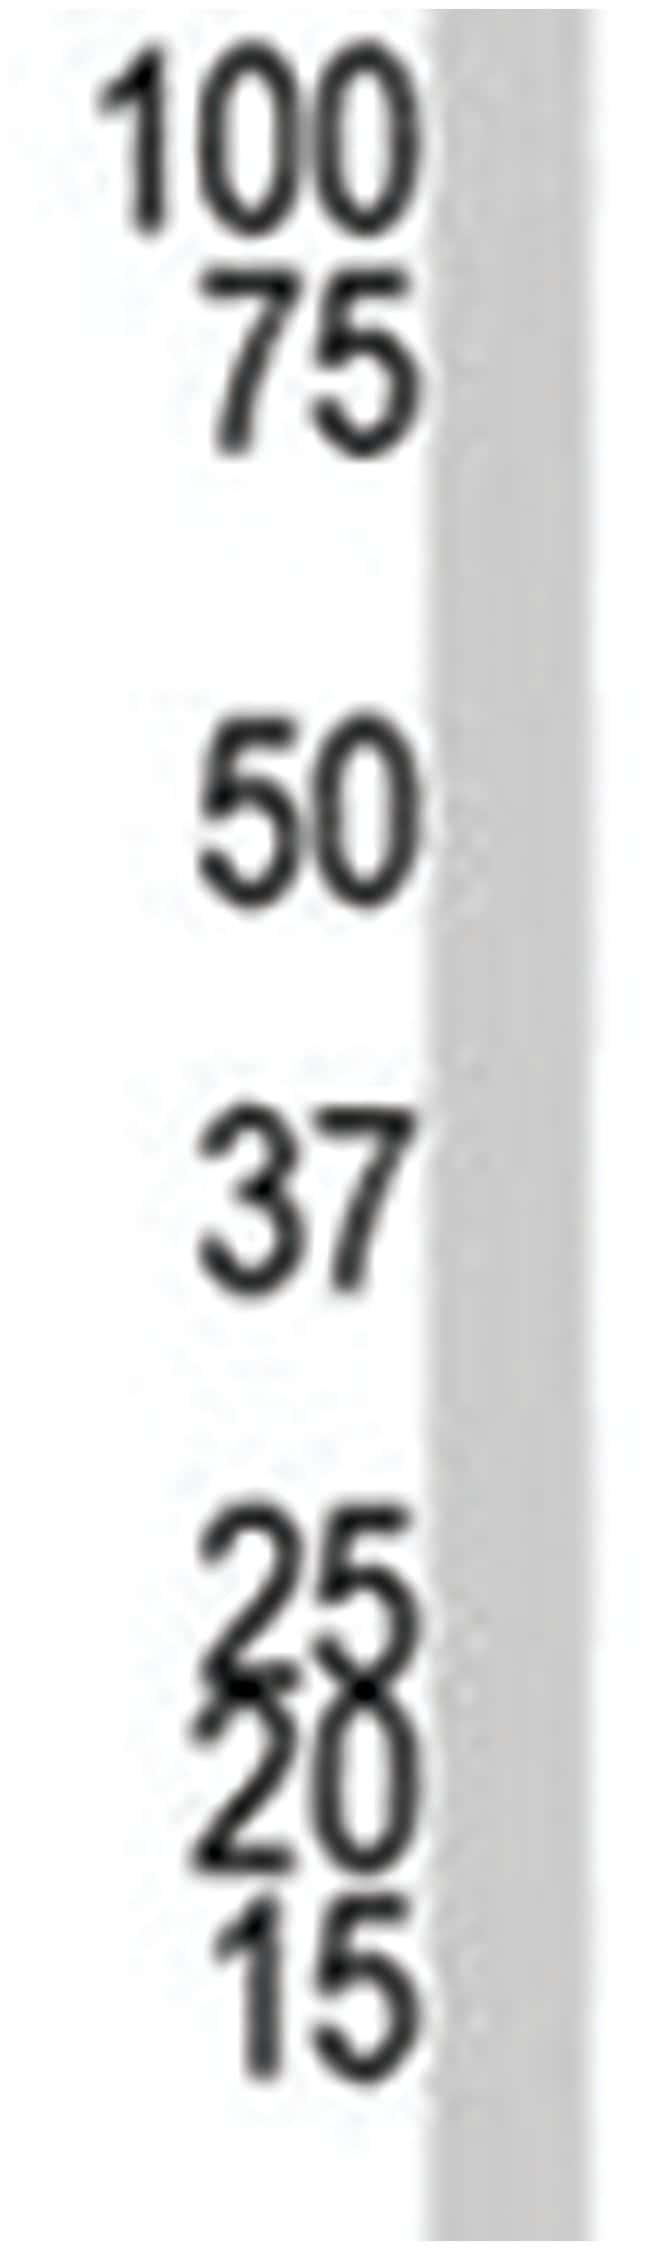 DNMT1 Rabbit anti-Human, Polyclonal Antibody, Abnova 400µL; Unlabeled:Life